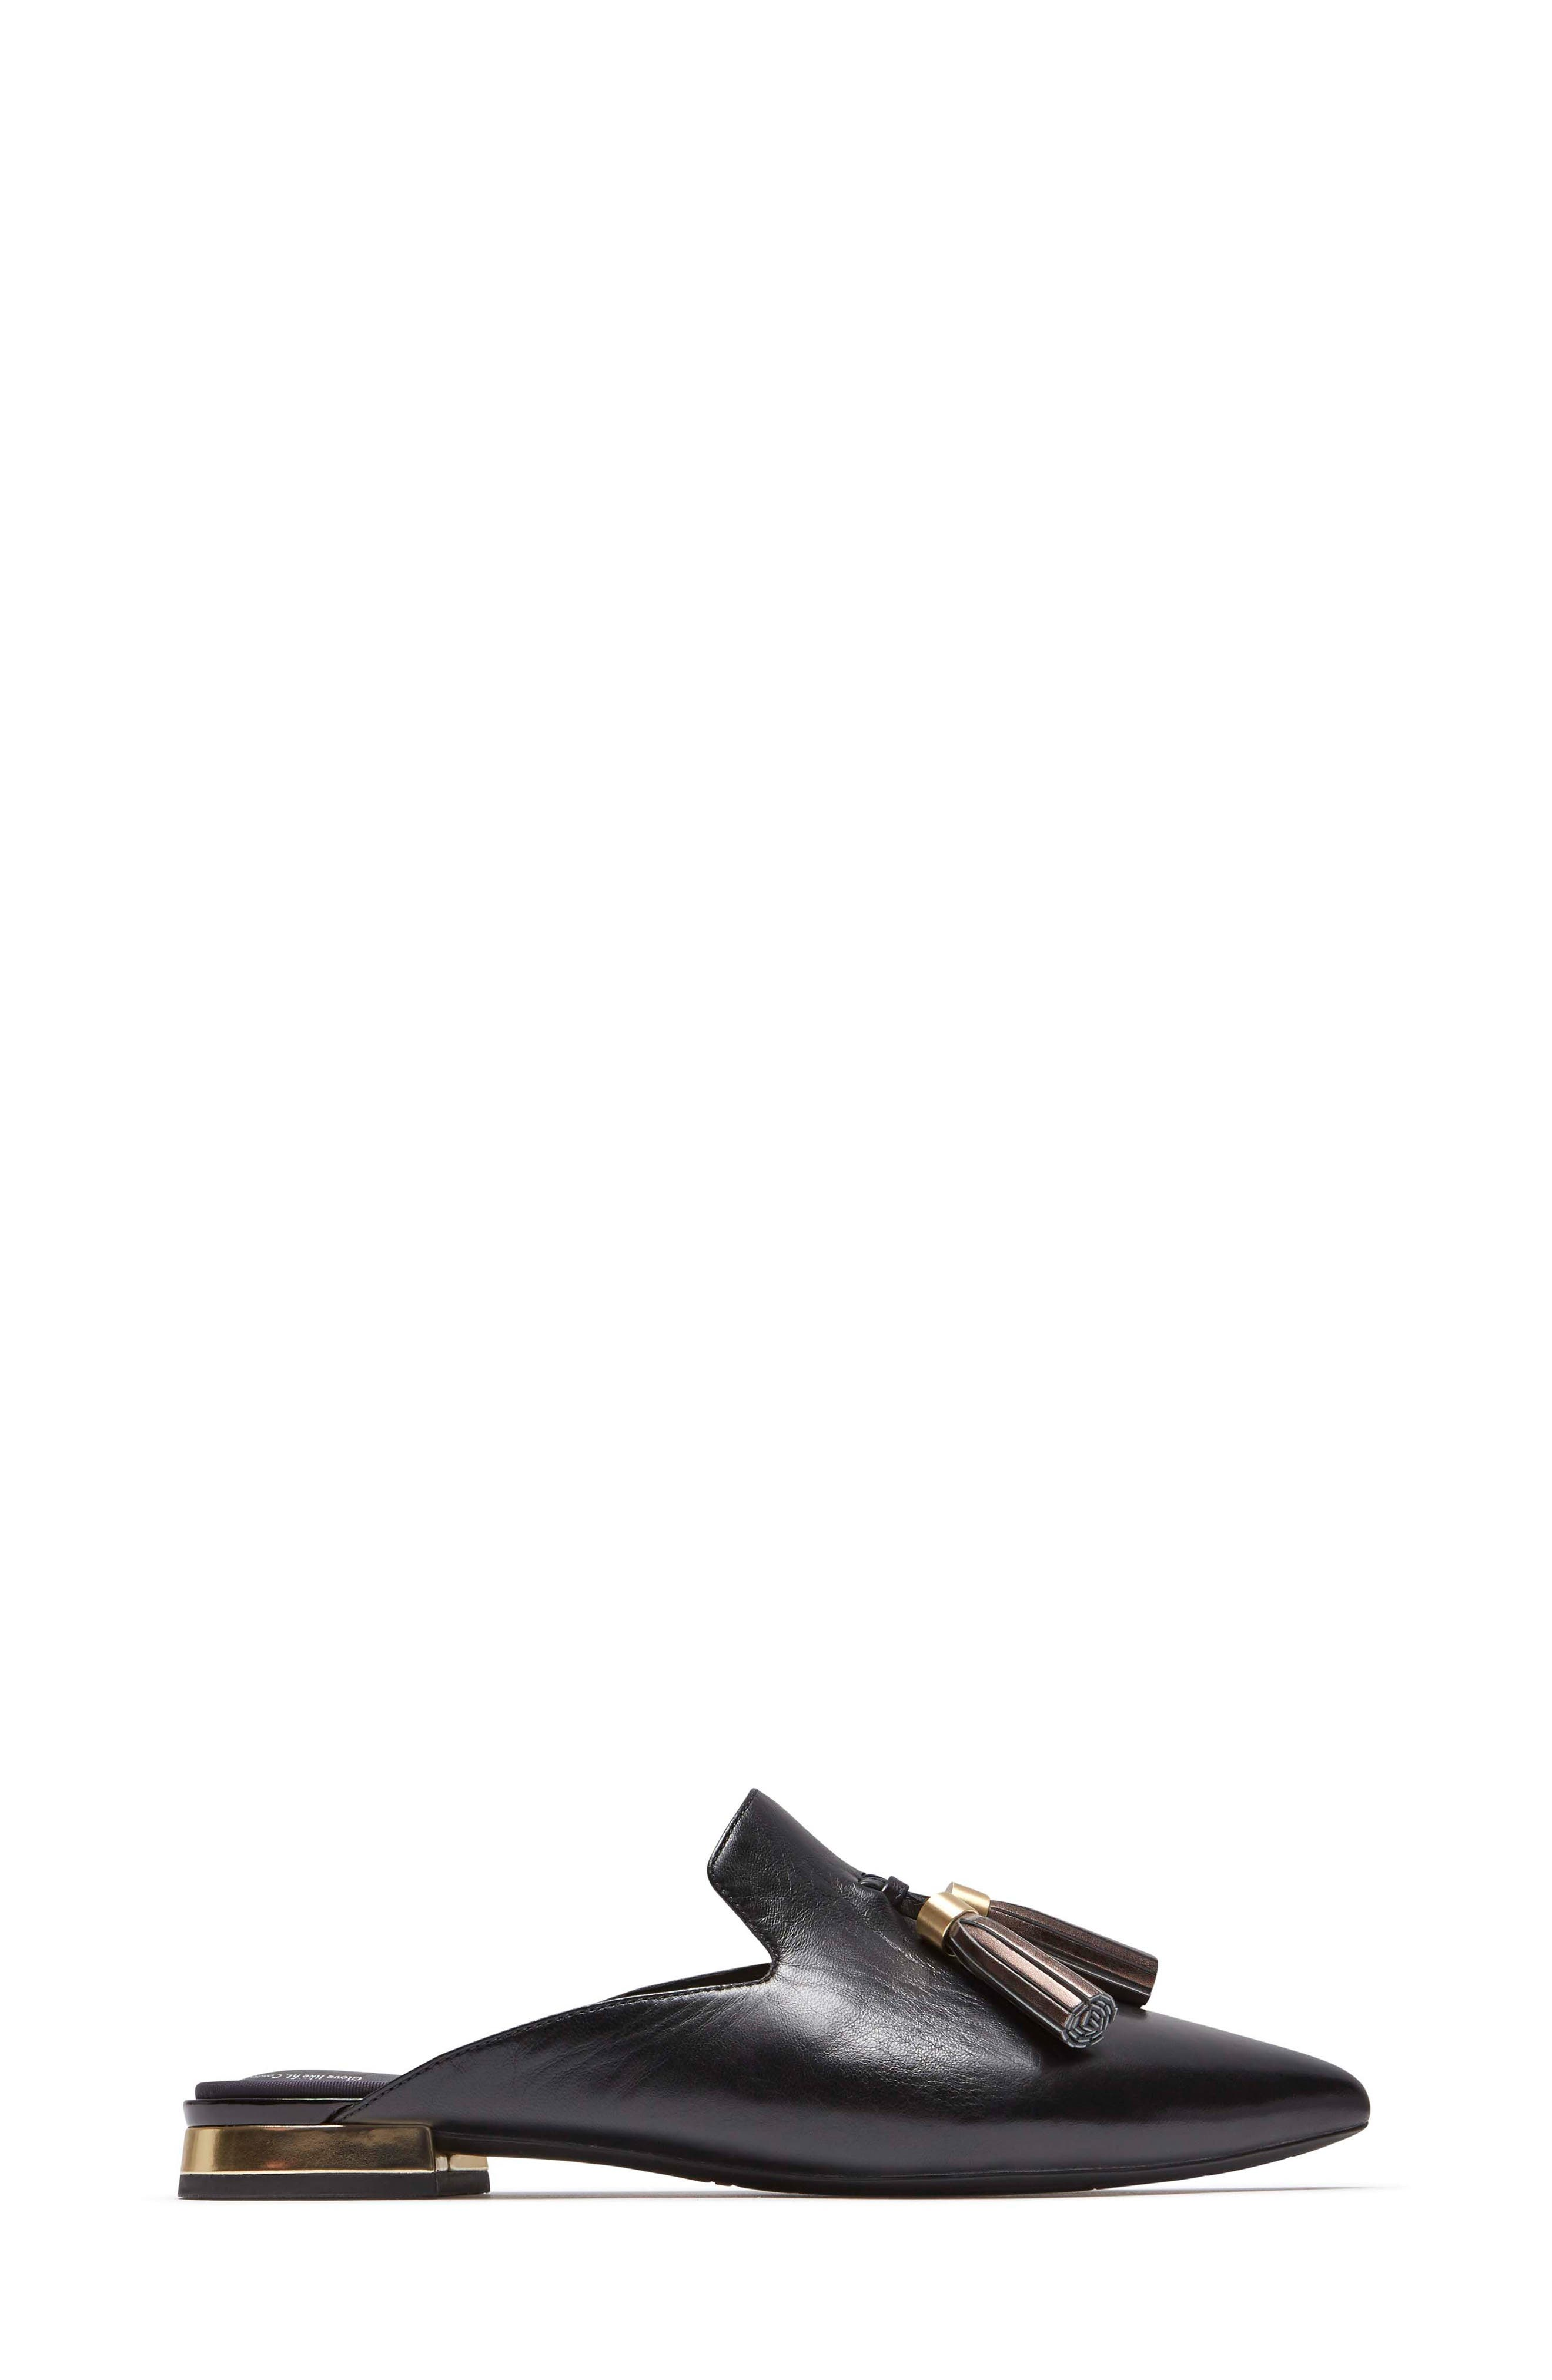 ROCKPORT, Total Motion Zuly Tassel Mule, Alternate thumbnail 3, color, BLACK LEATHER